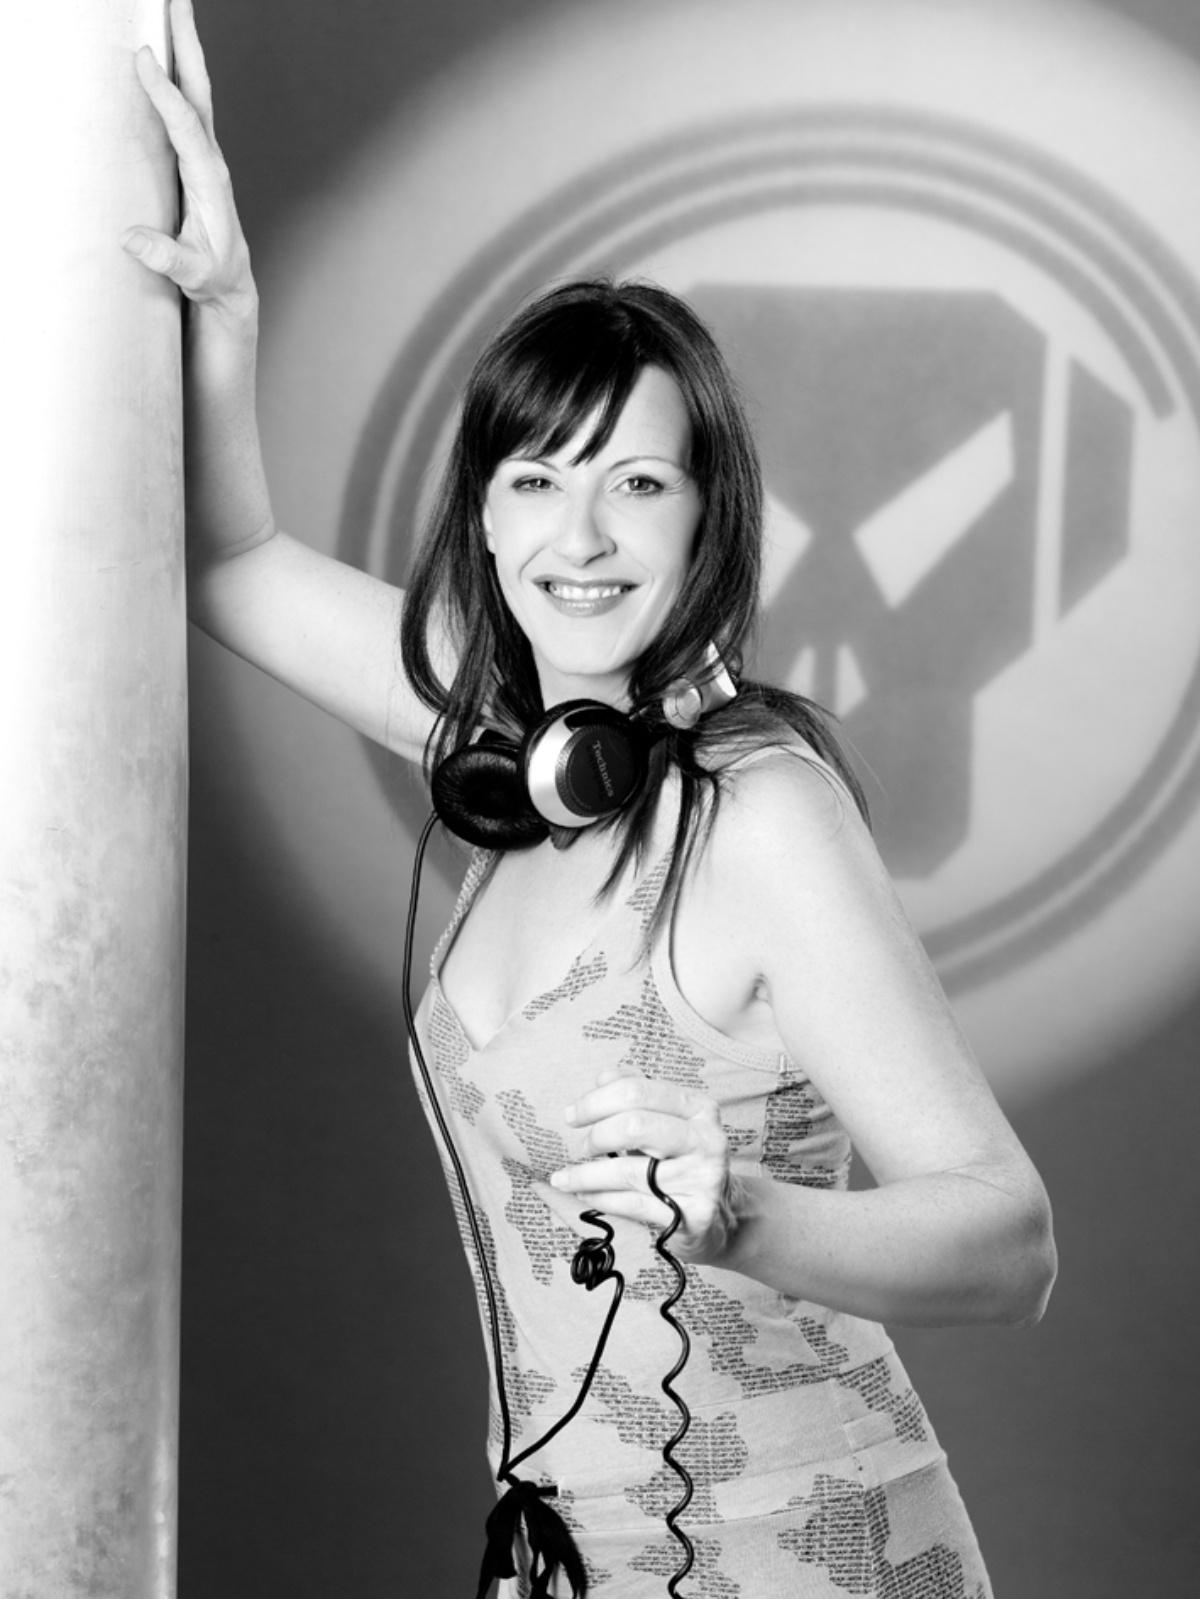 Vierjarig bestaan Planet Jungle met DJ Storm - limburg